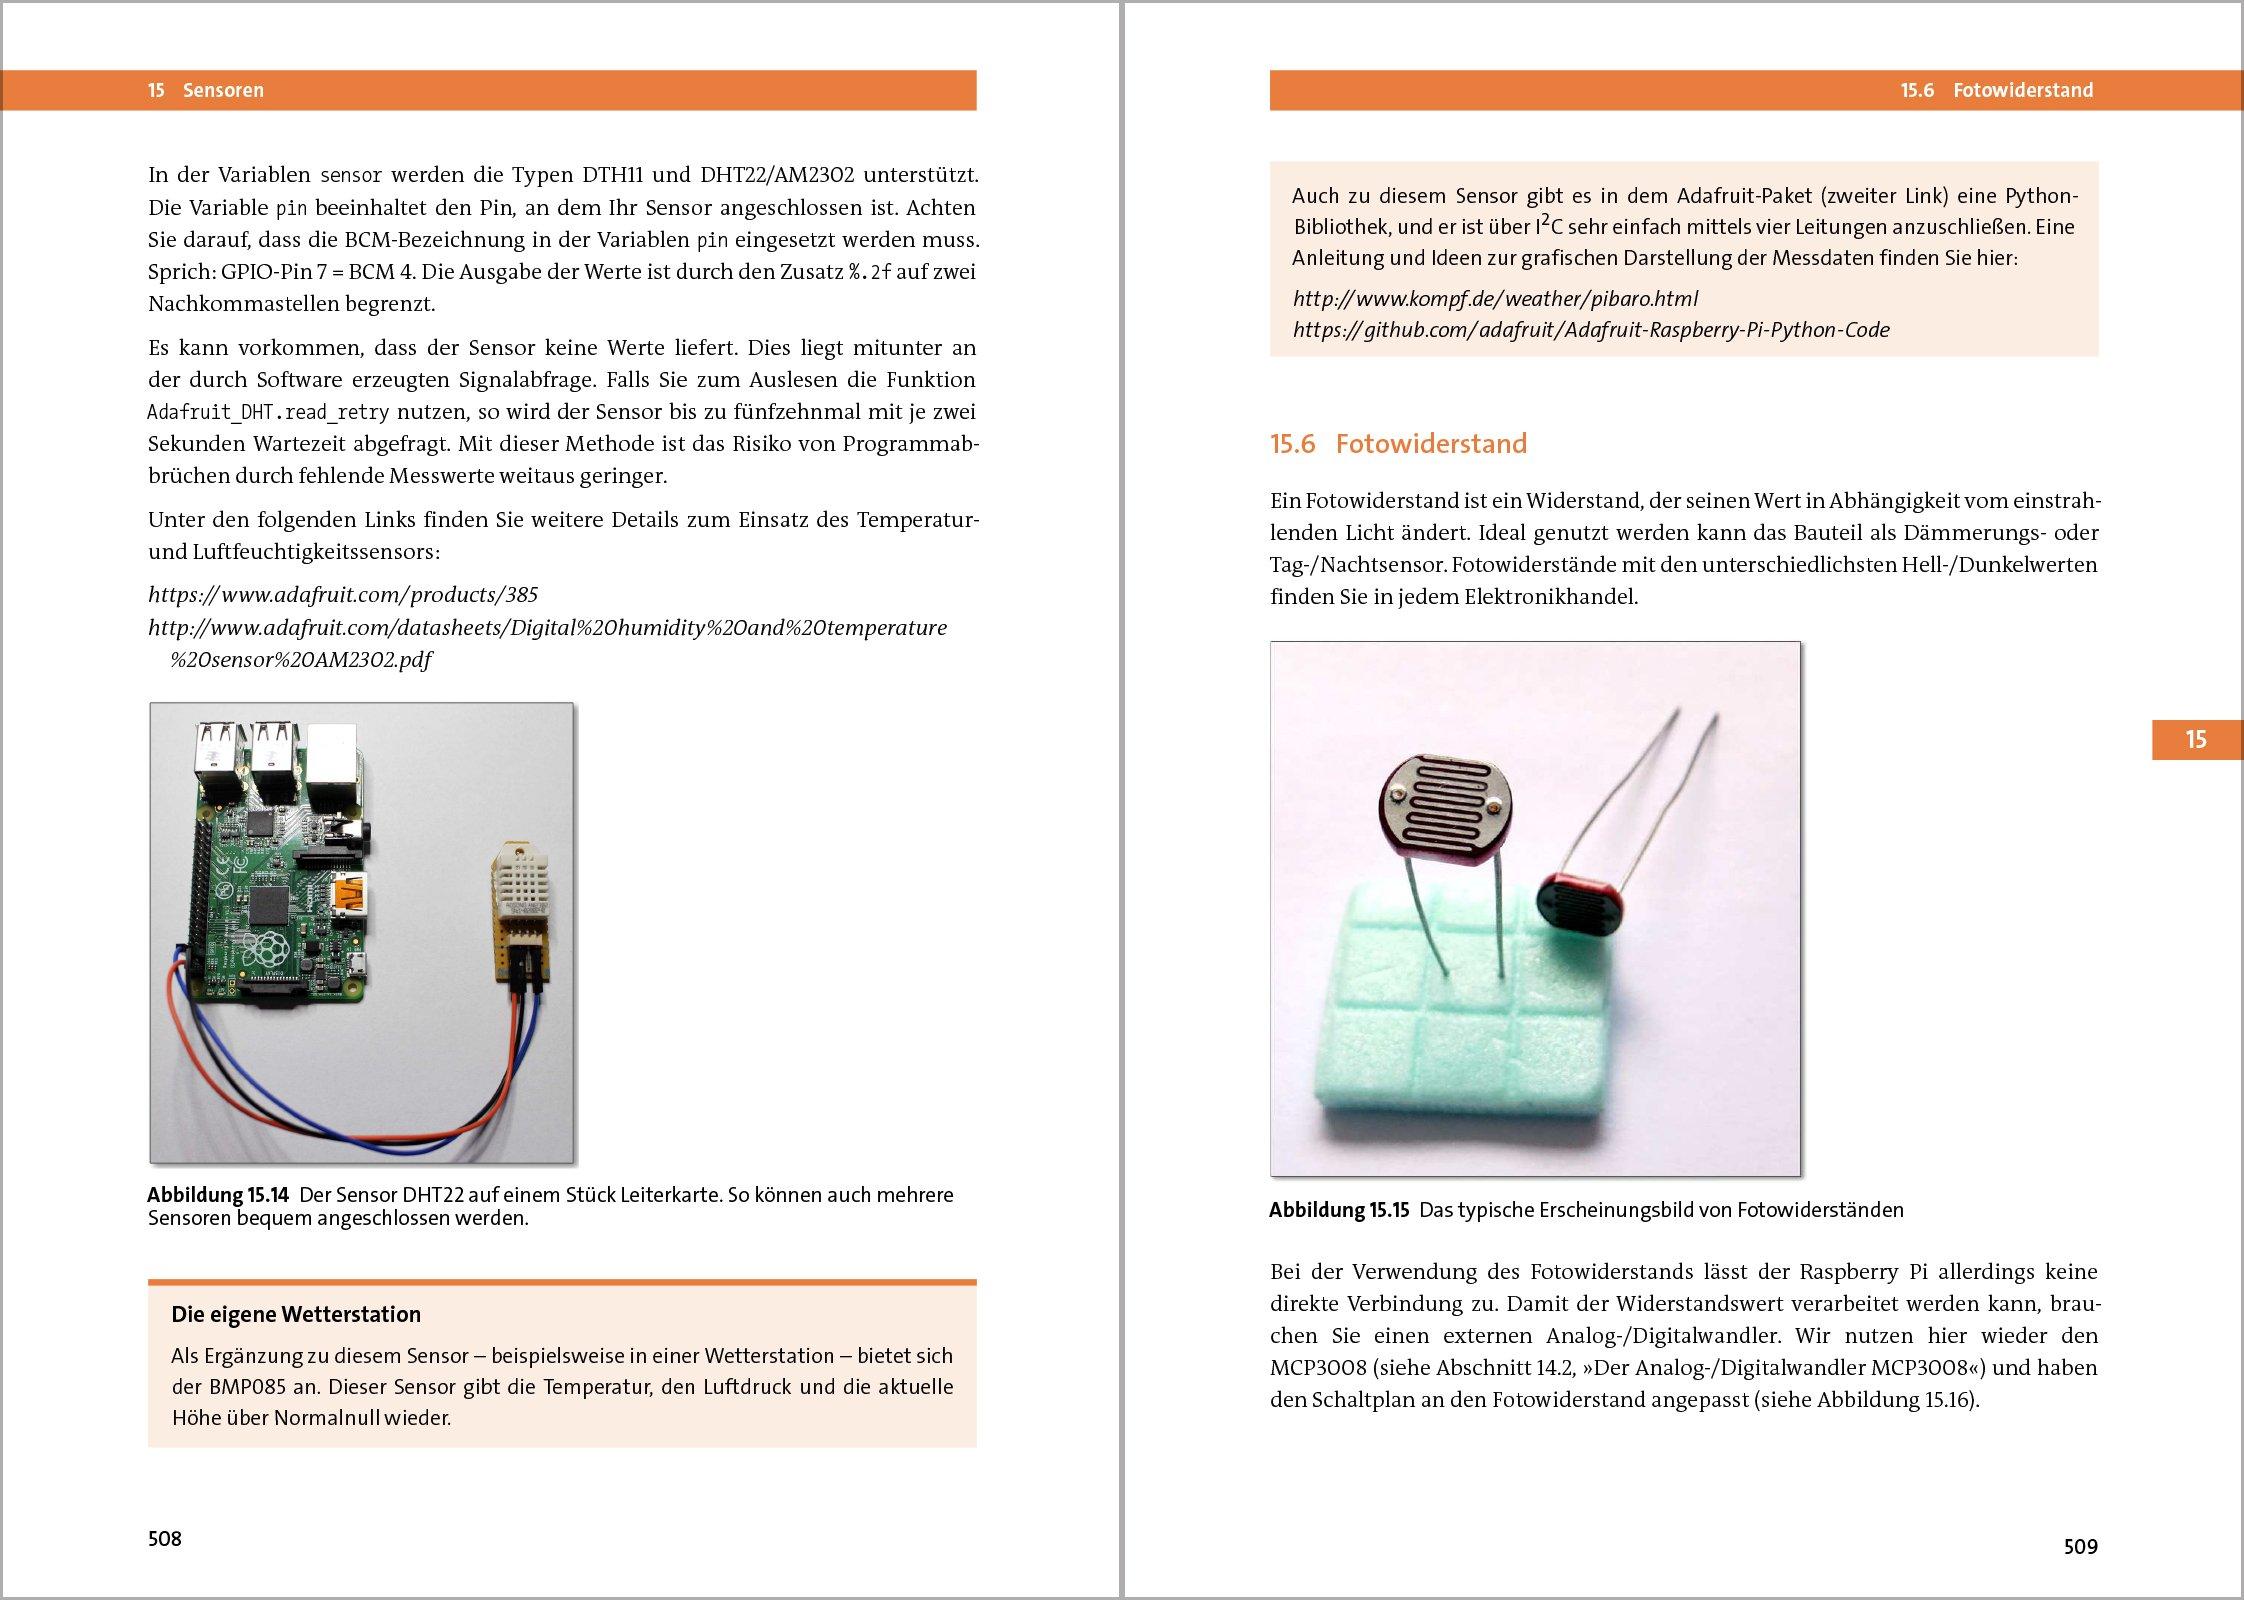 Raspberry Pi: Das umfassende Handbuch. Komplett in Farbe - inkl ...